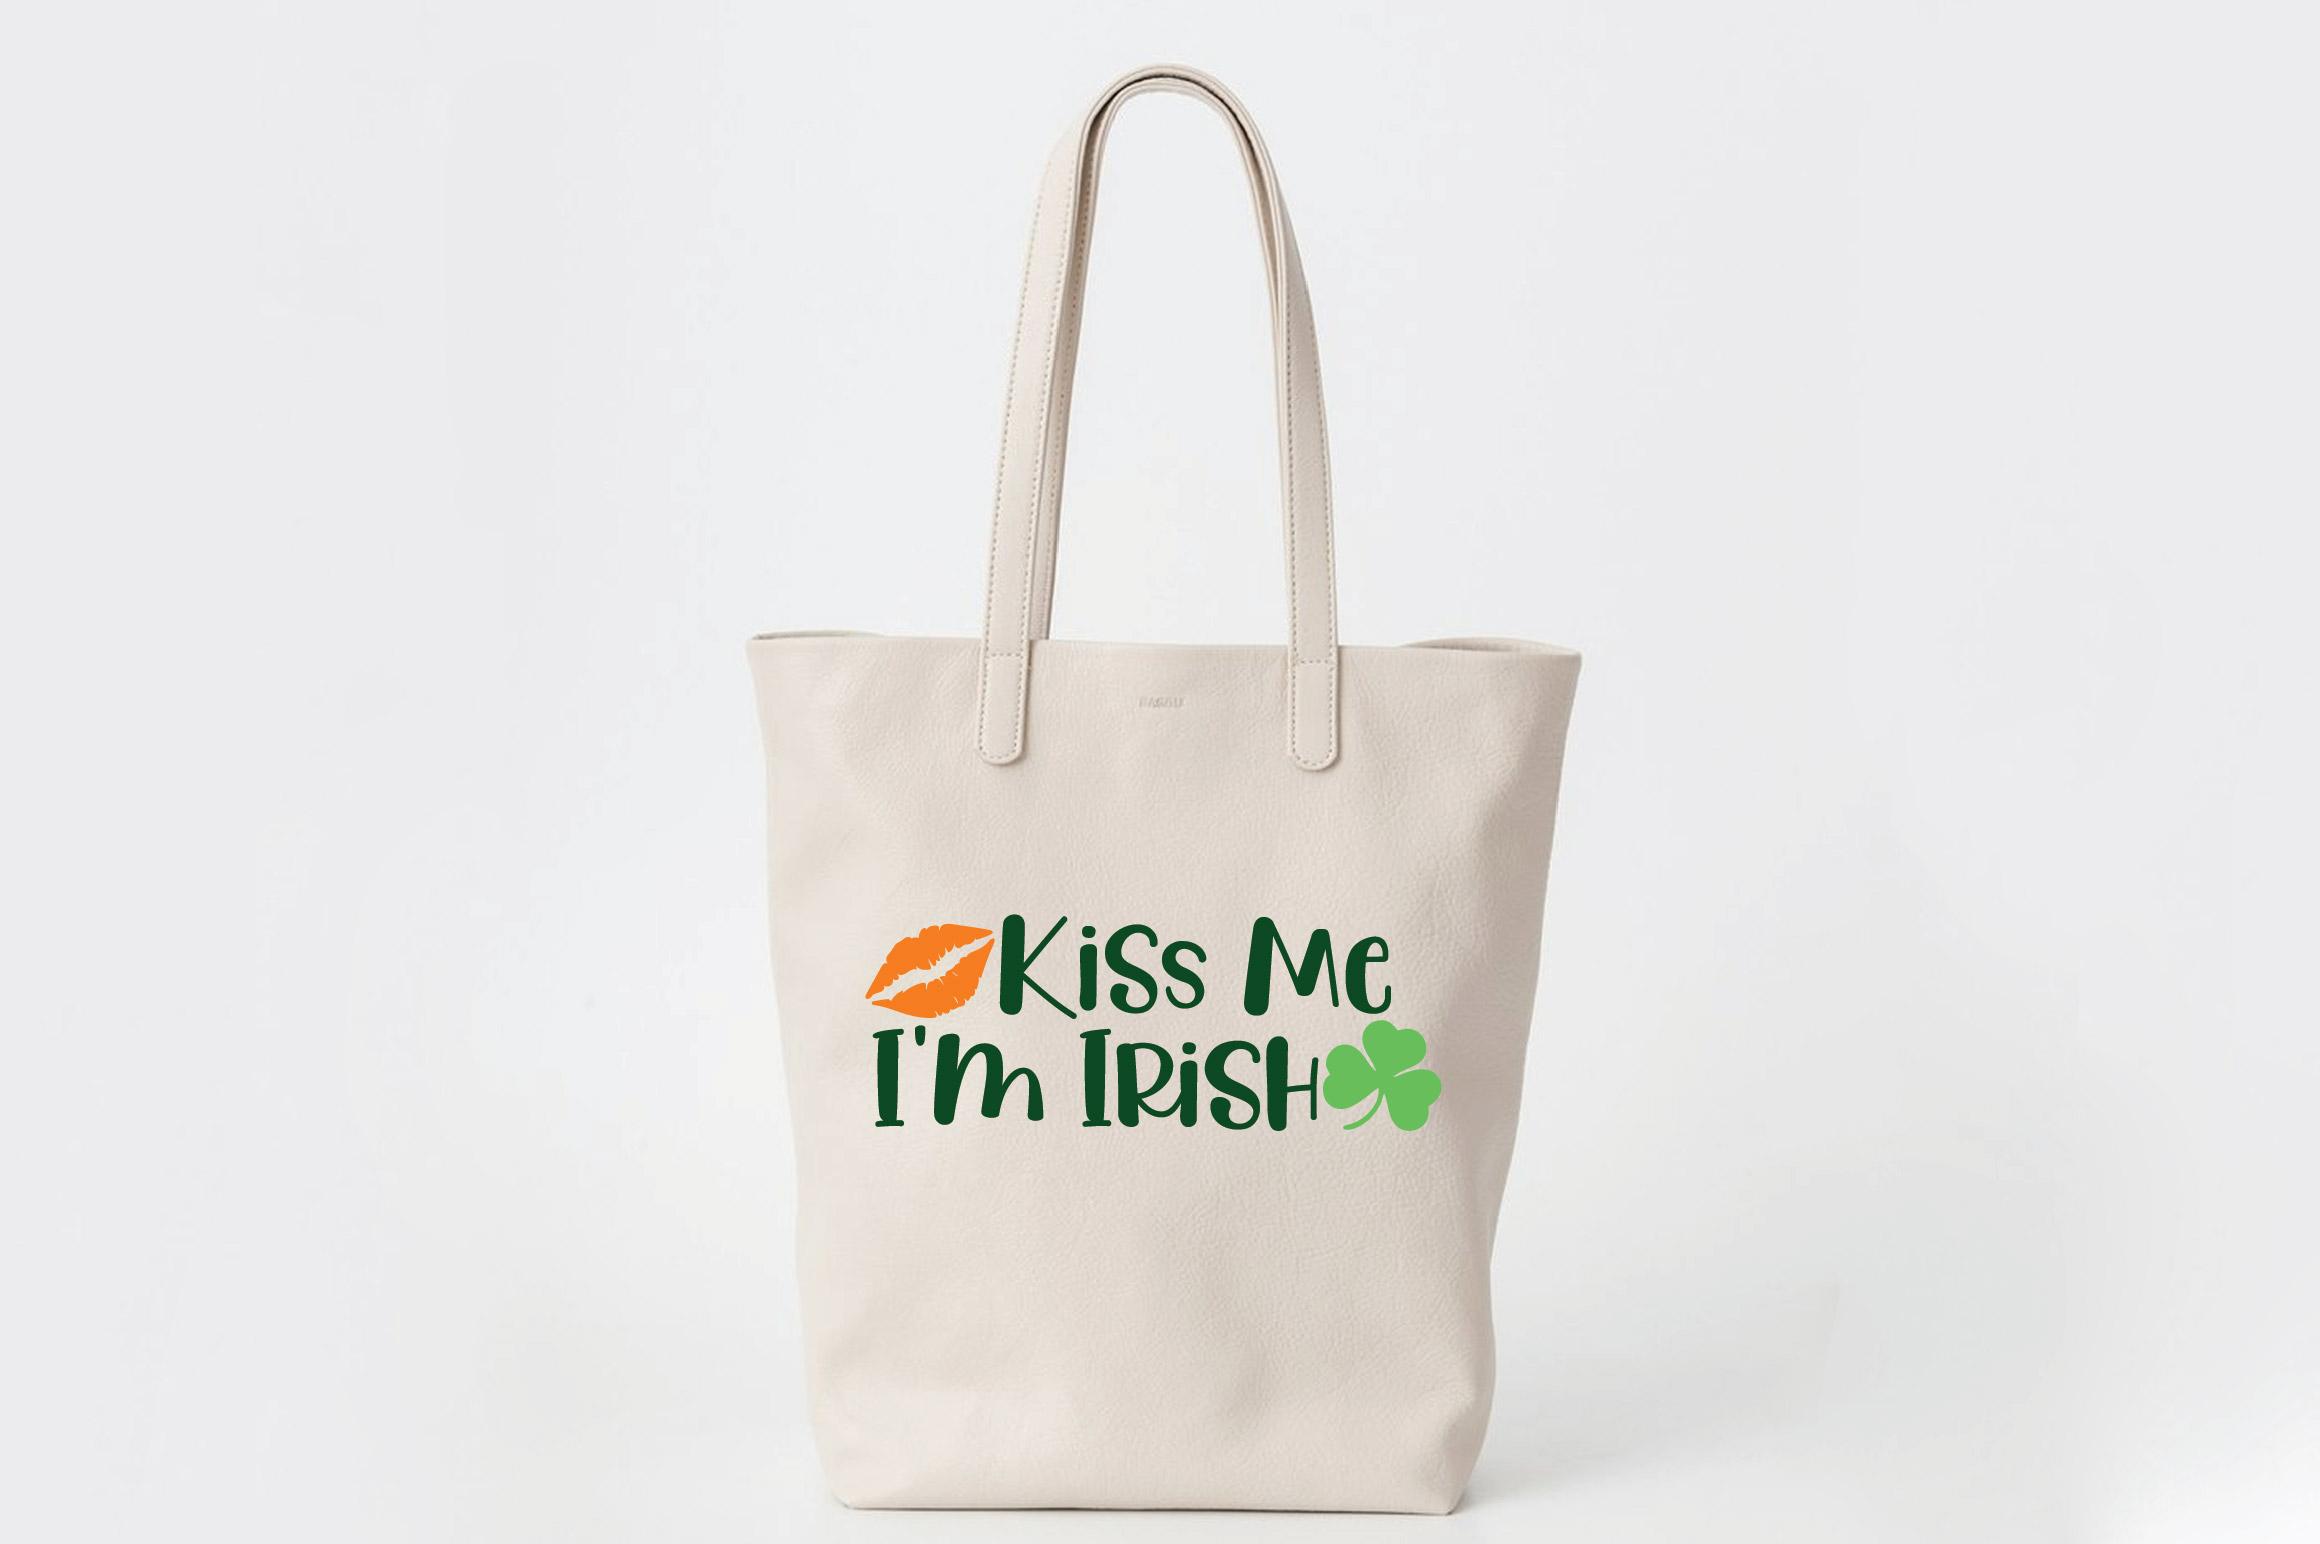 Kiss Me I'm Irish SVG Cut File - St. Patrick's Day SVG - DXF example image 5